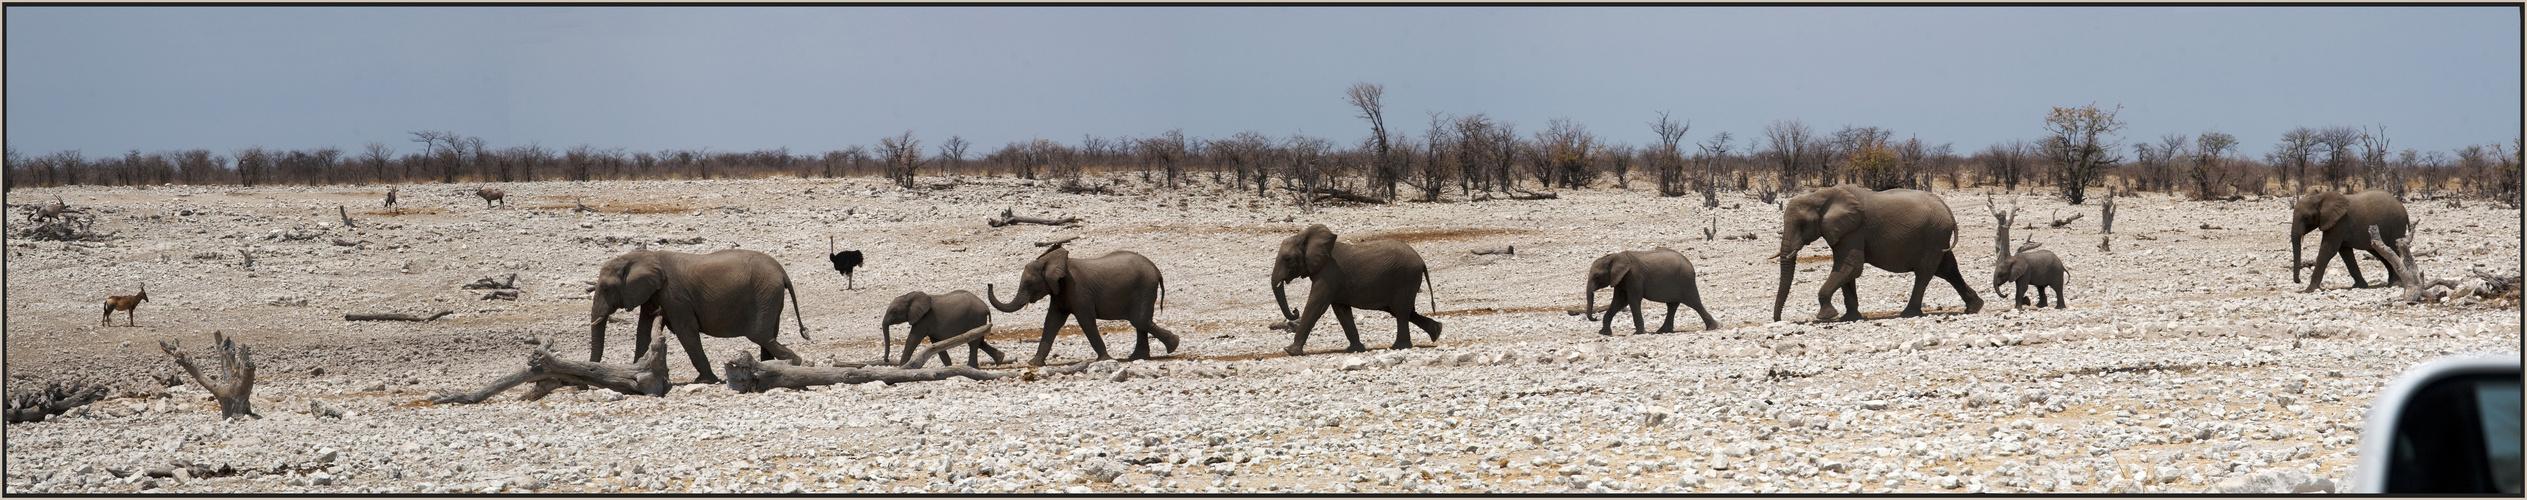 Etosha National Park - Elefantenparade